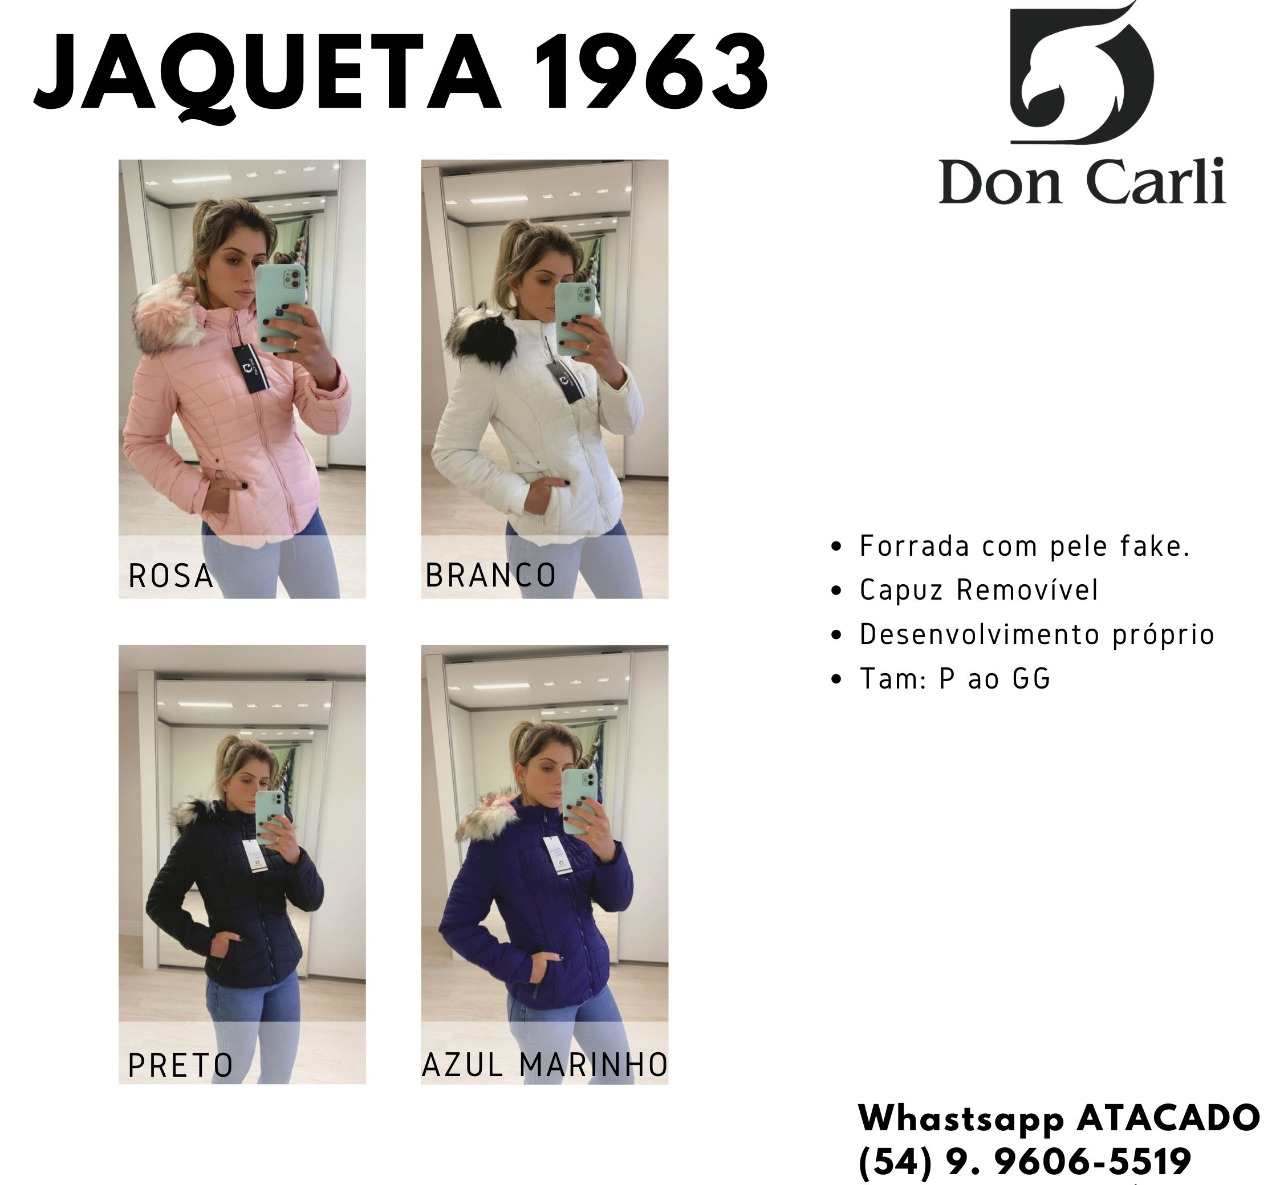 Jaqueta Don Carli 1963